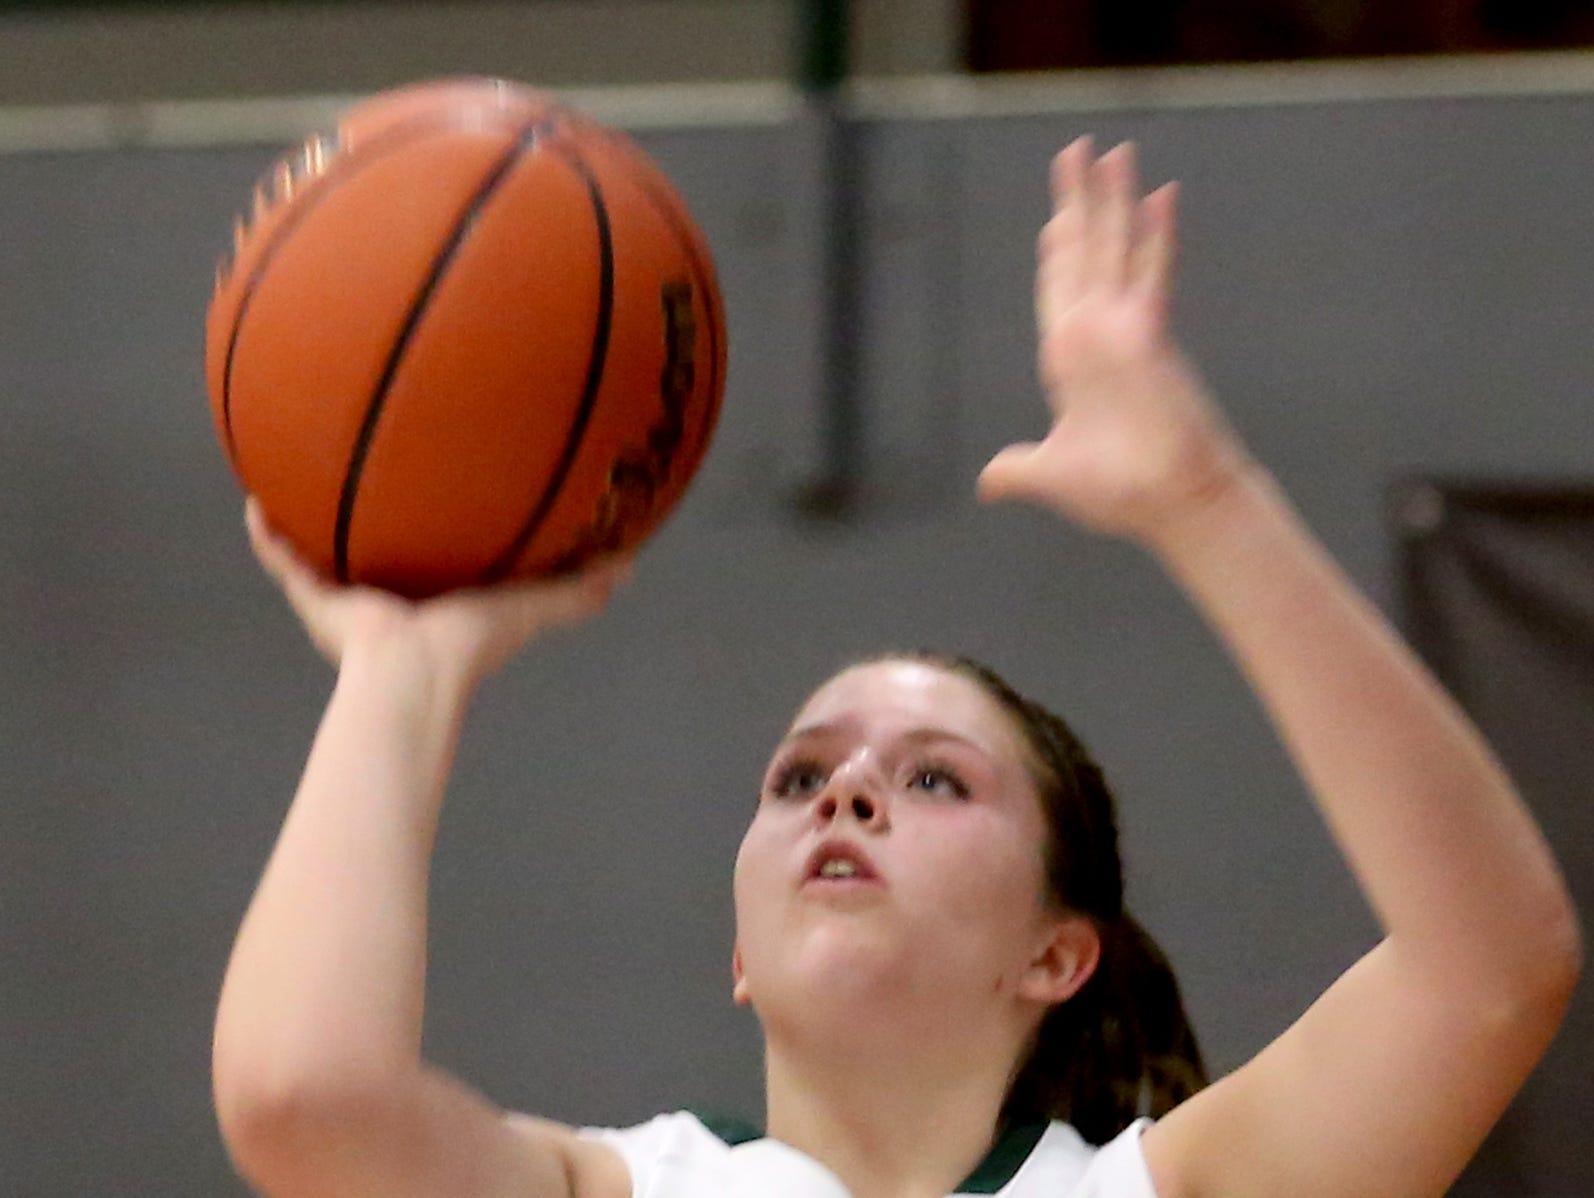 Salem Academy's Aimee Smith (5) shoots the ball in the Blanchet vs. Salem Academy girl's basketball game at Salem Academy High School on Thursday, Jan. 14, 2016. Blanchet won the game 56-43.